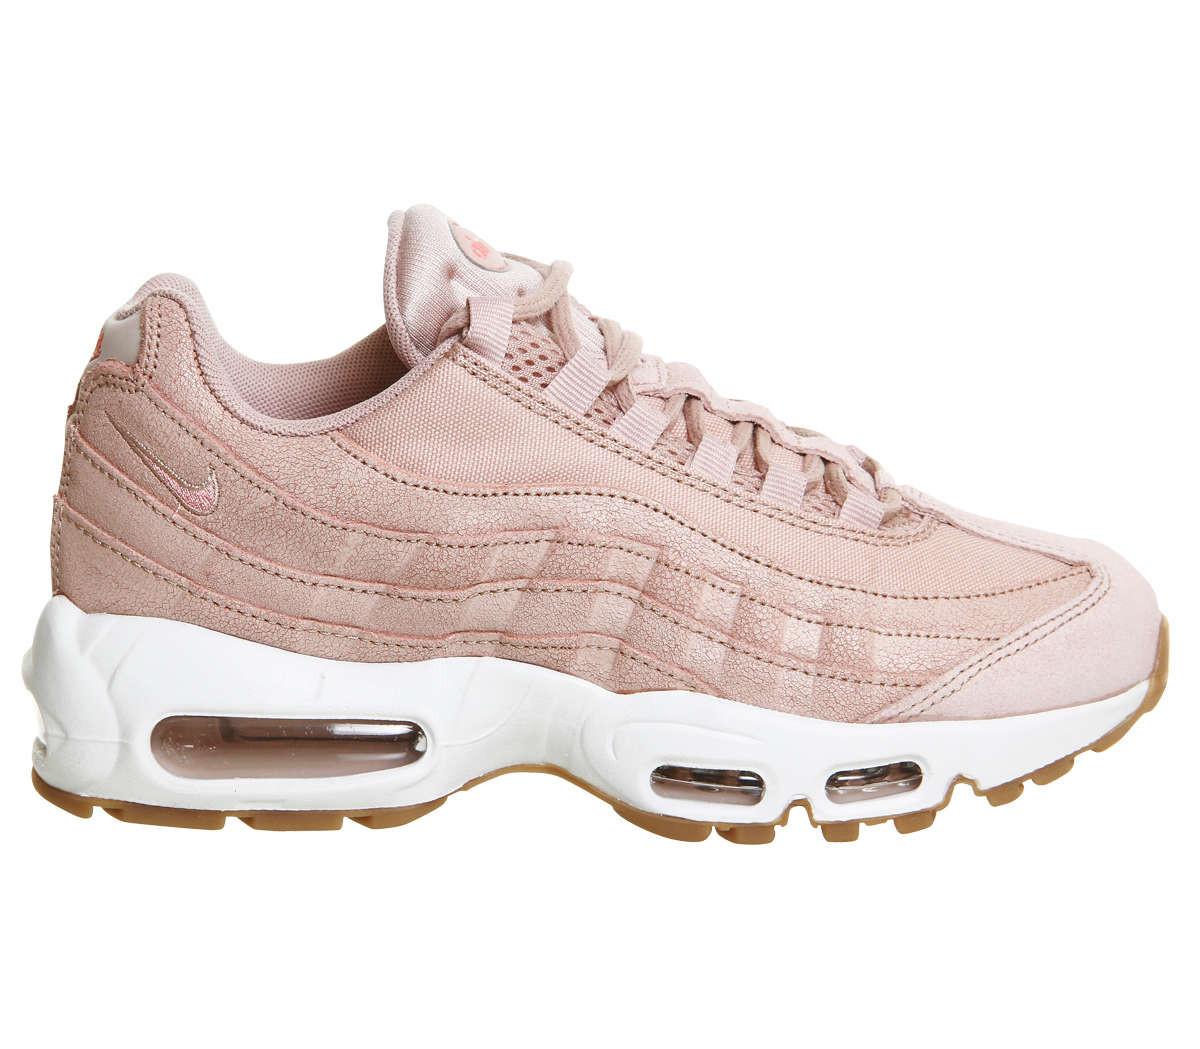 Кроссовки Женские Nike Air Max 95 Premium Pink Oxford